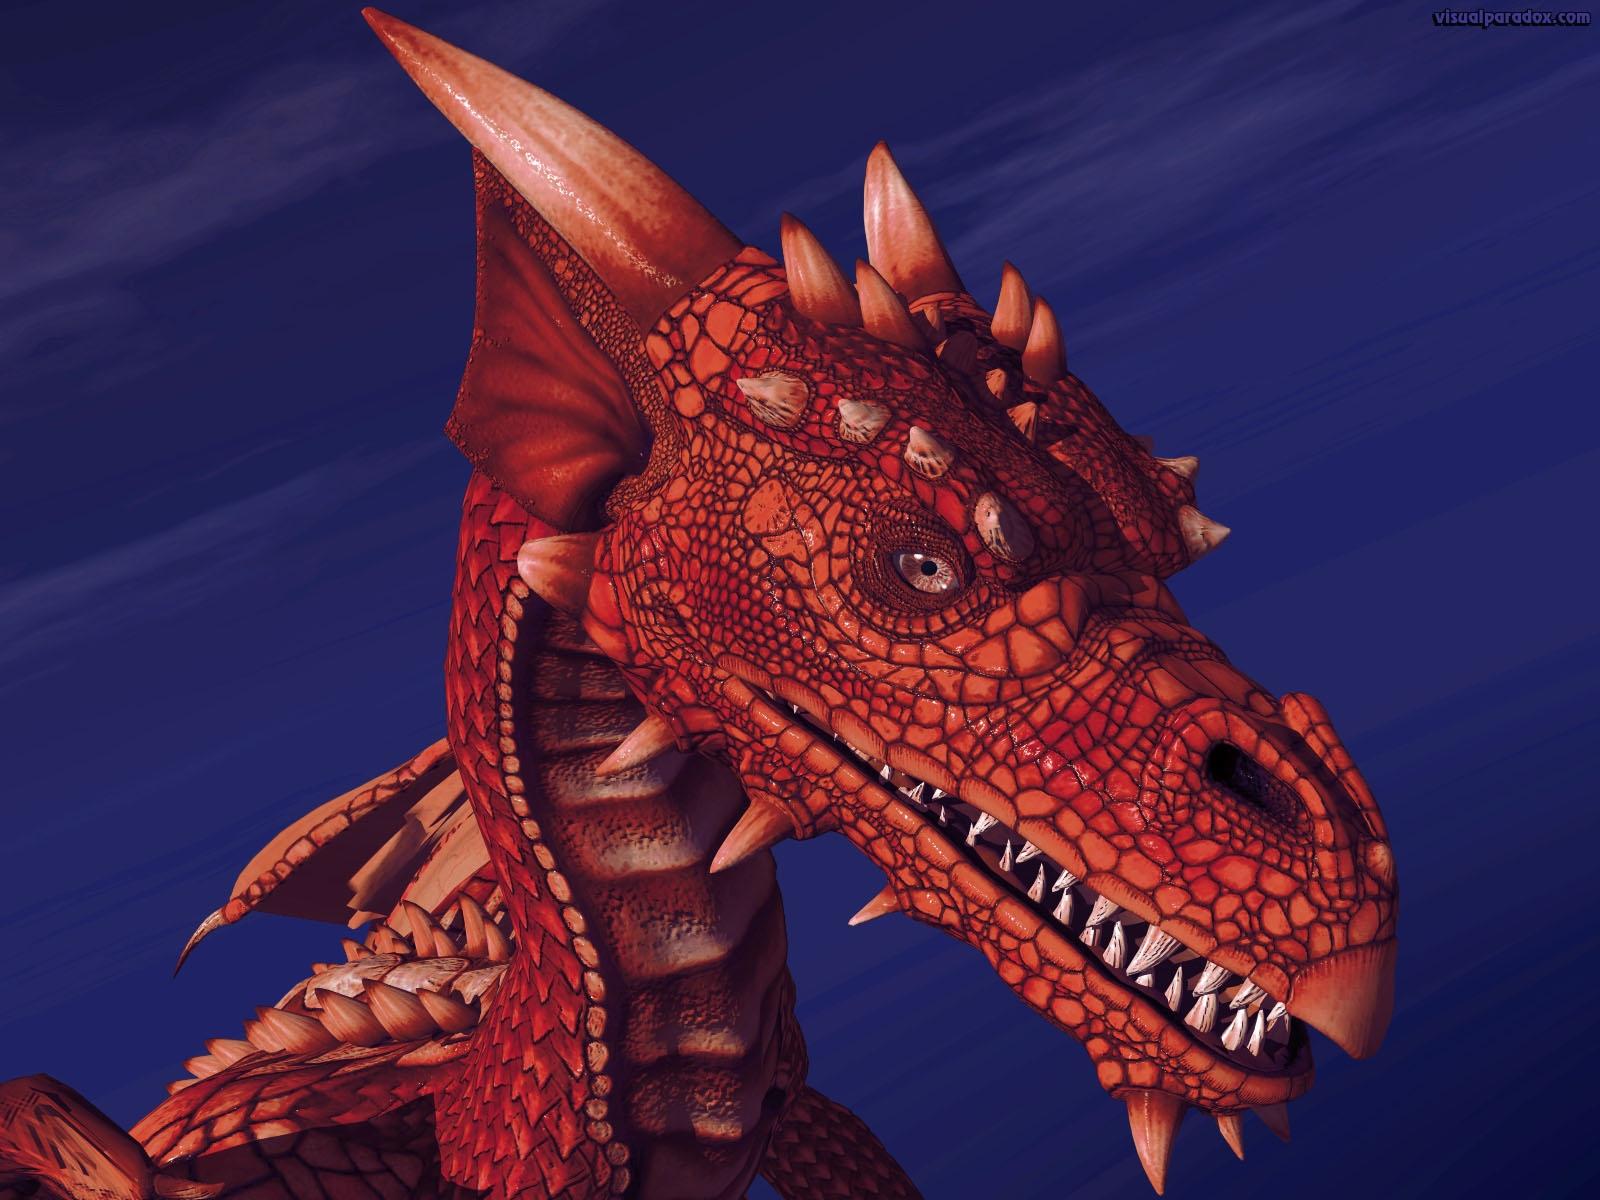 crimson dragon wallpaper - photo #3